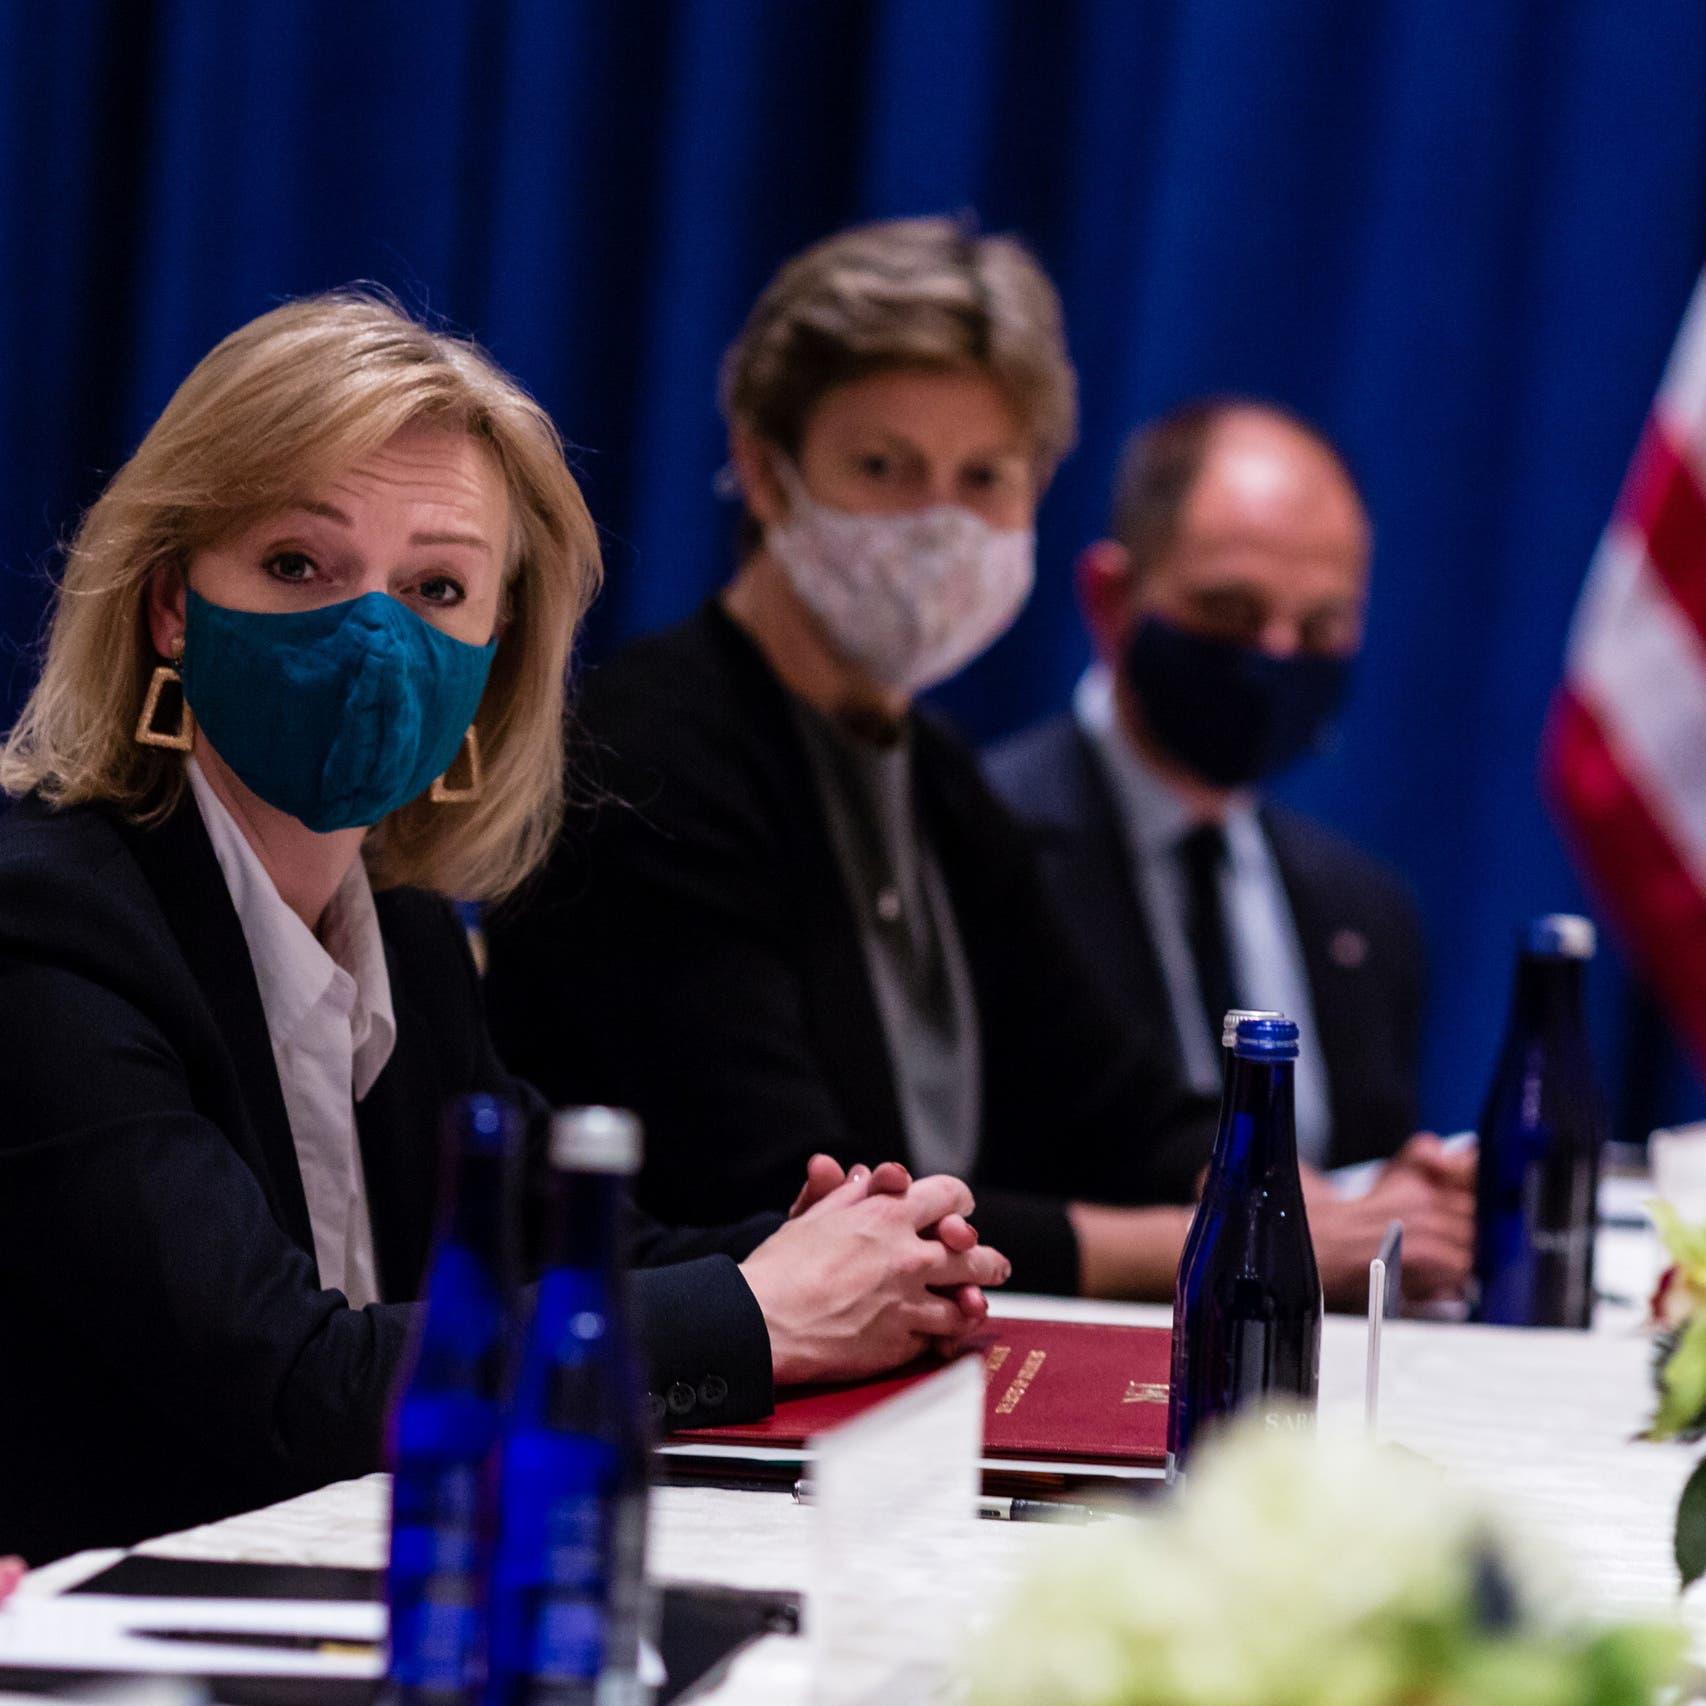 UK, US discuss Iran, Afghanistan, security deal